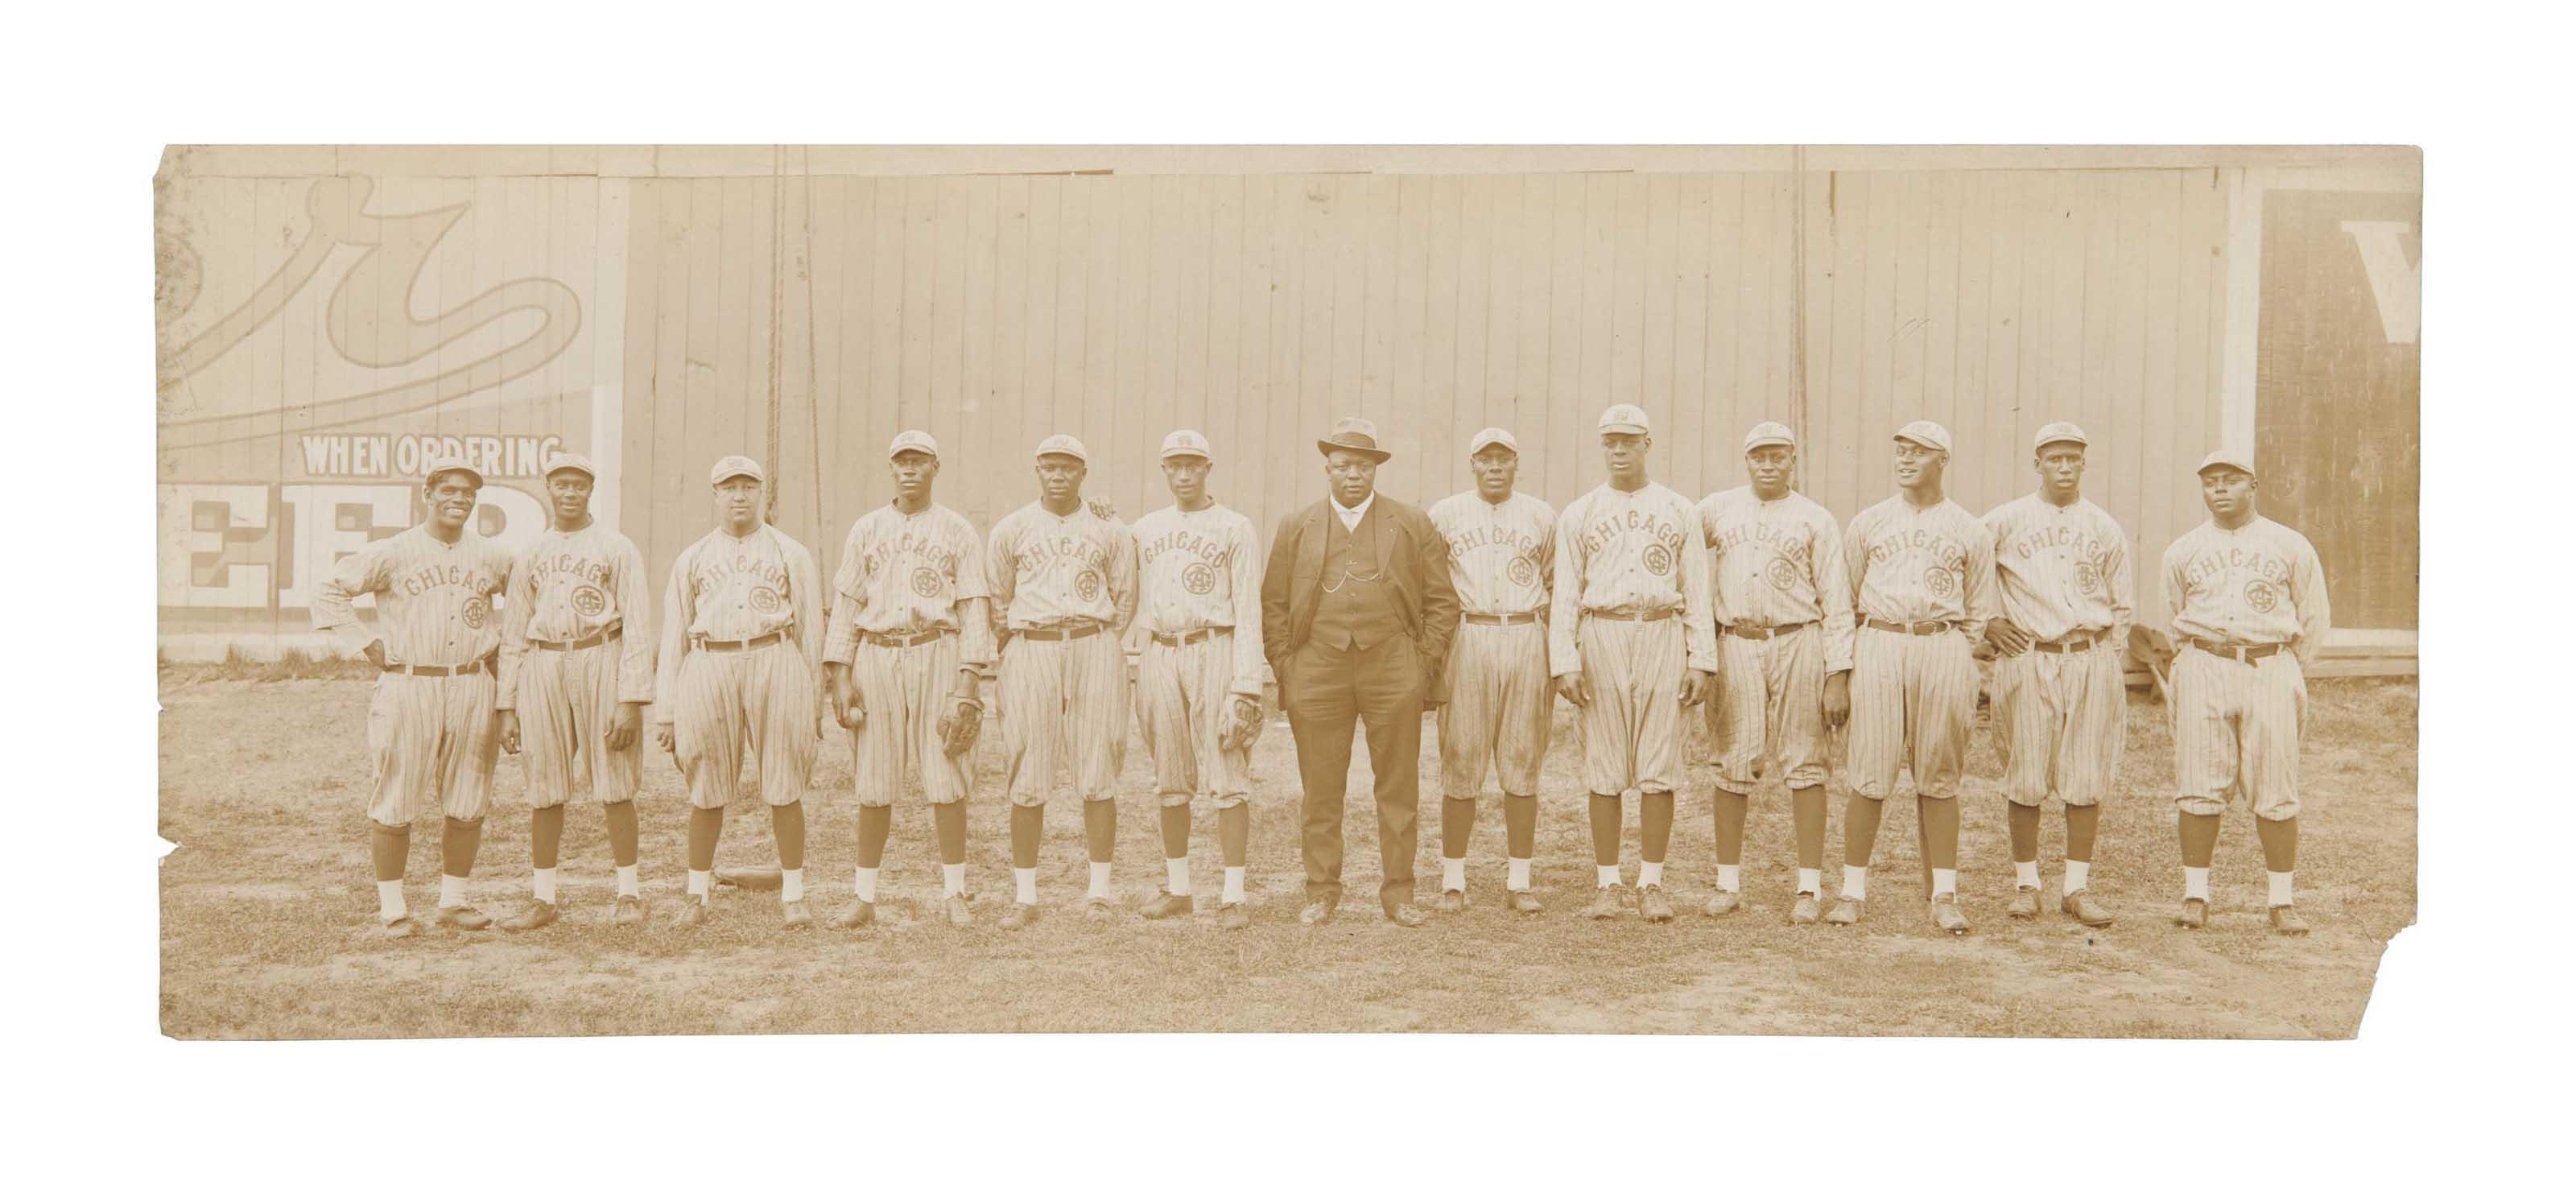 1916 CHICAGO AMERICAN GIANTS PANORAMIC PHOTOGRAPH